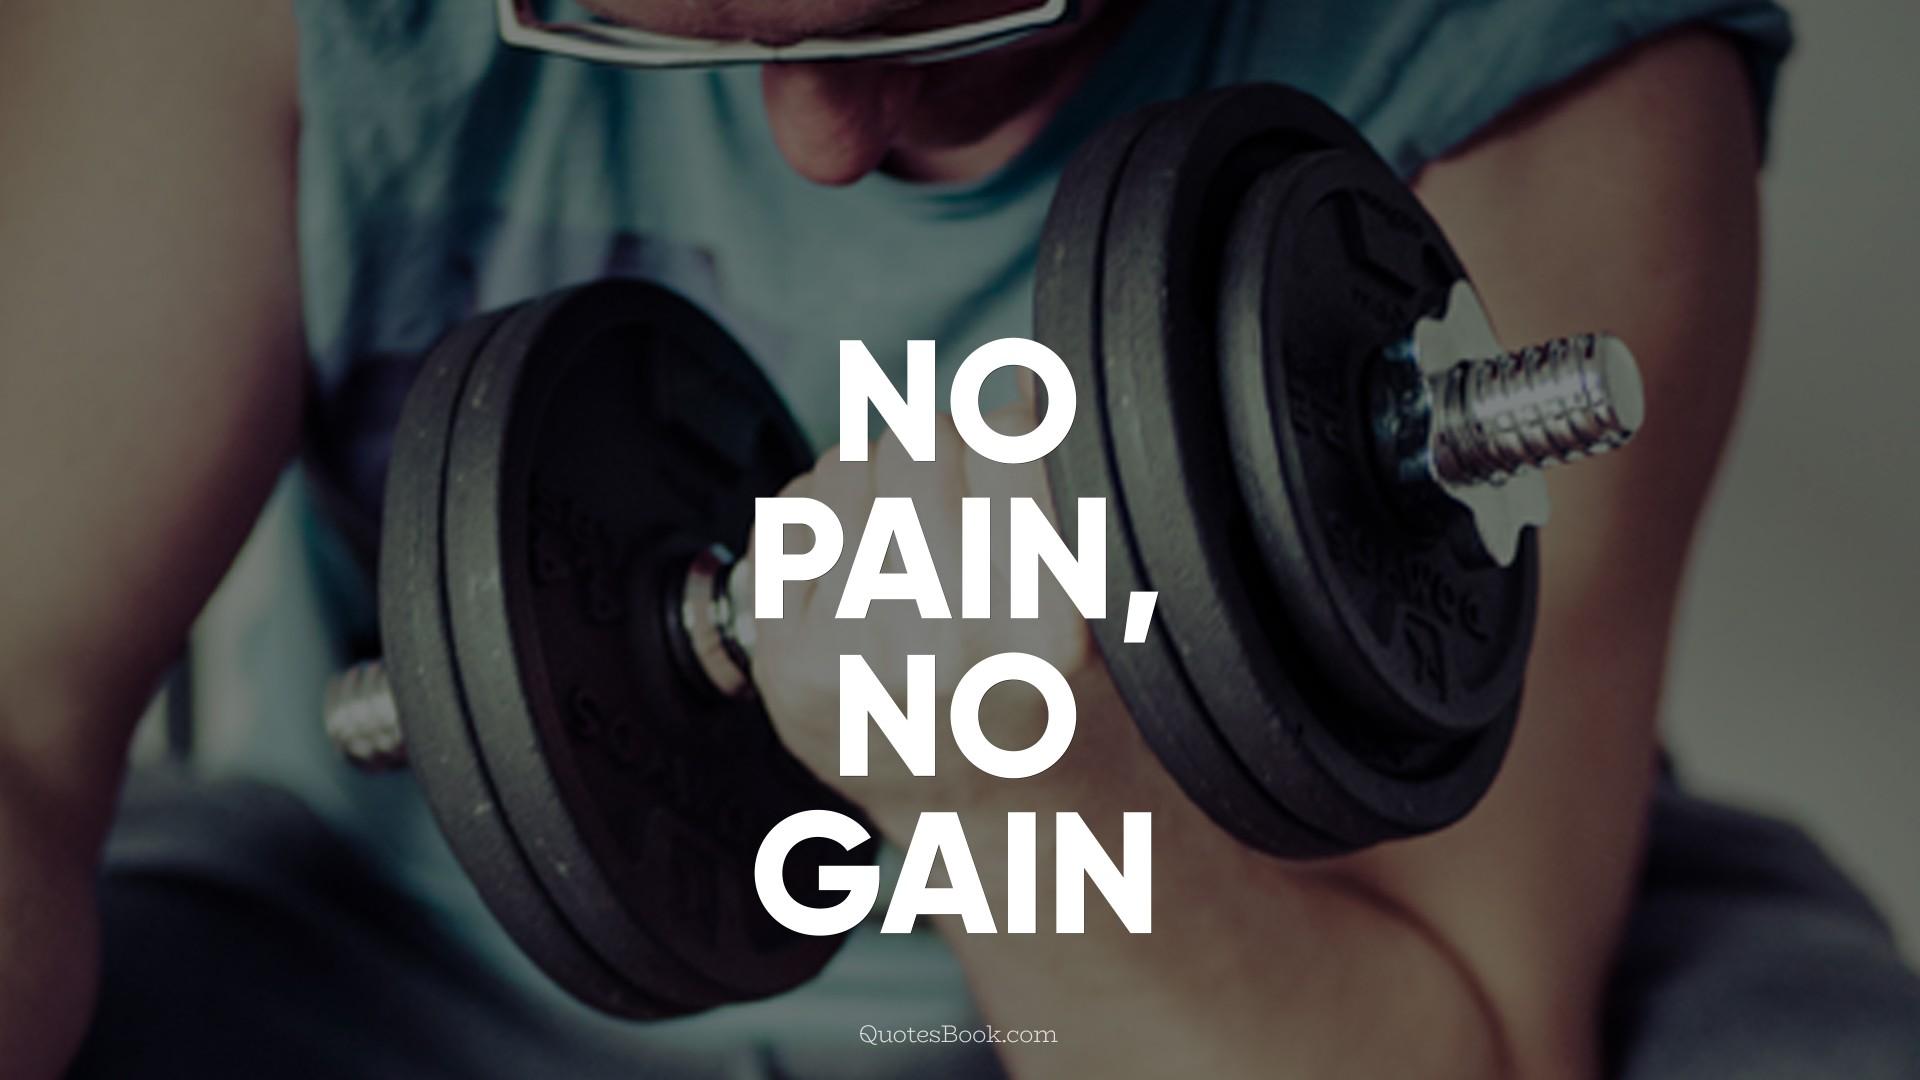 No Pain No Gain Page 3 Quotesbook